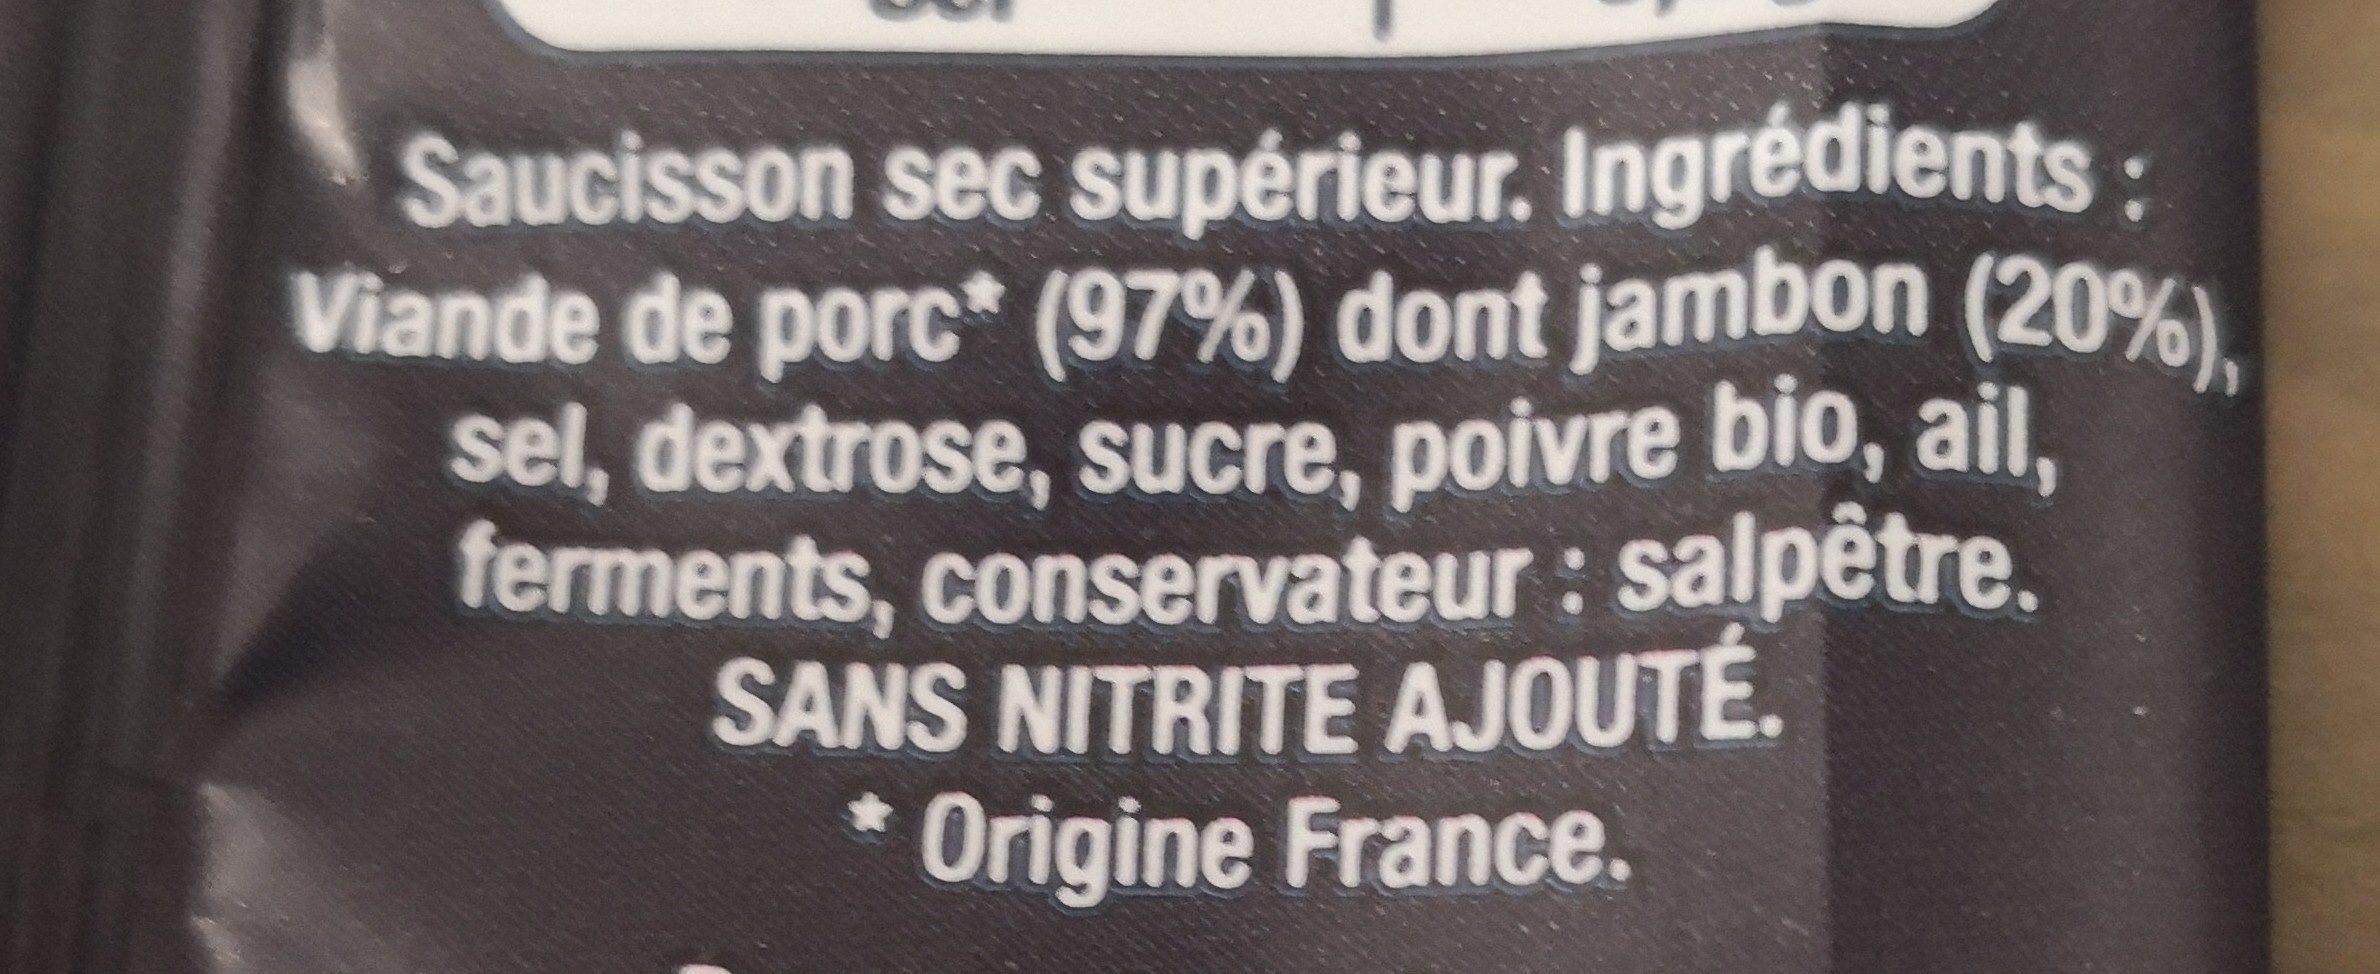 Le Saucisson Hénaff - Ingrediënten